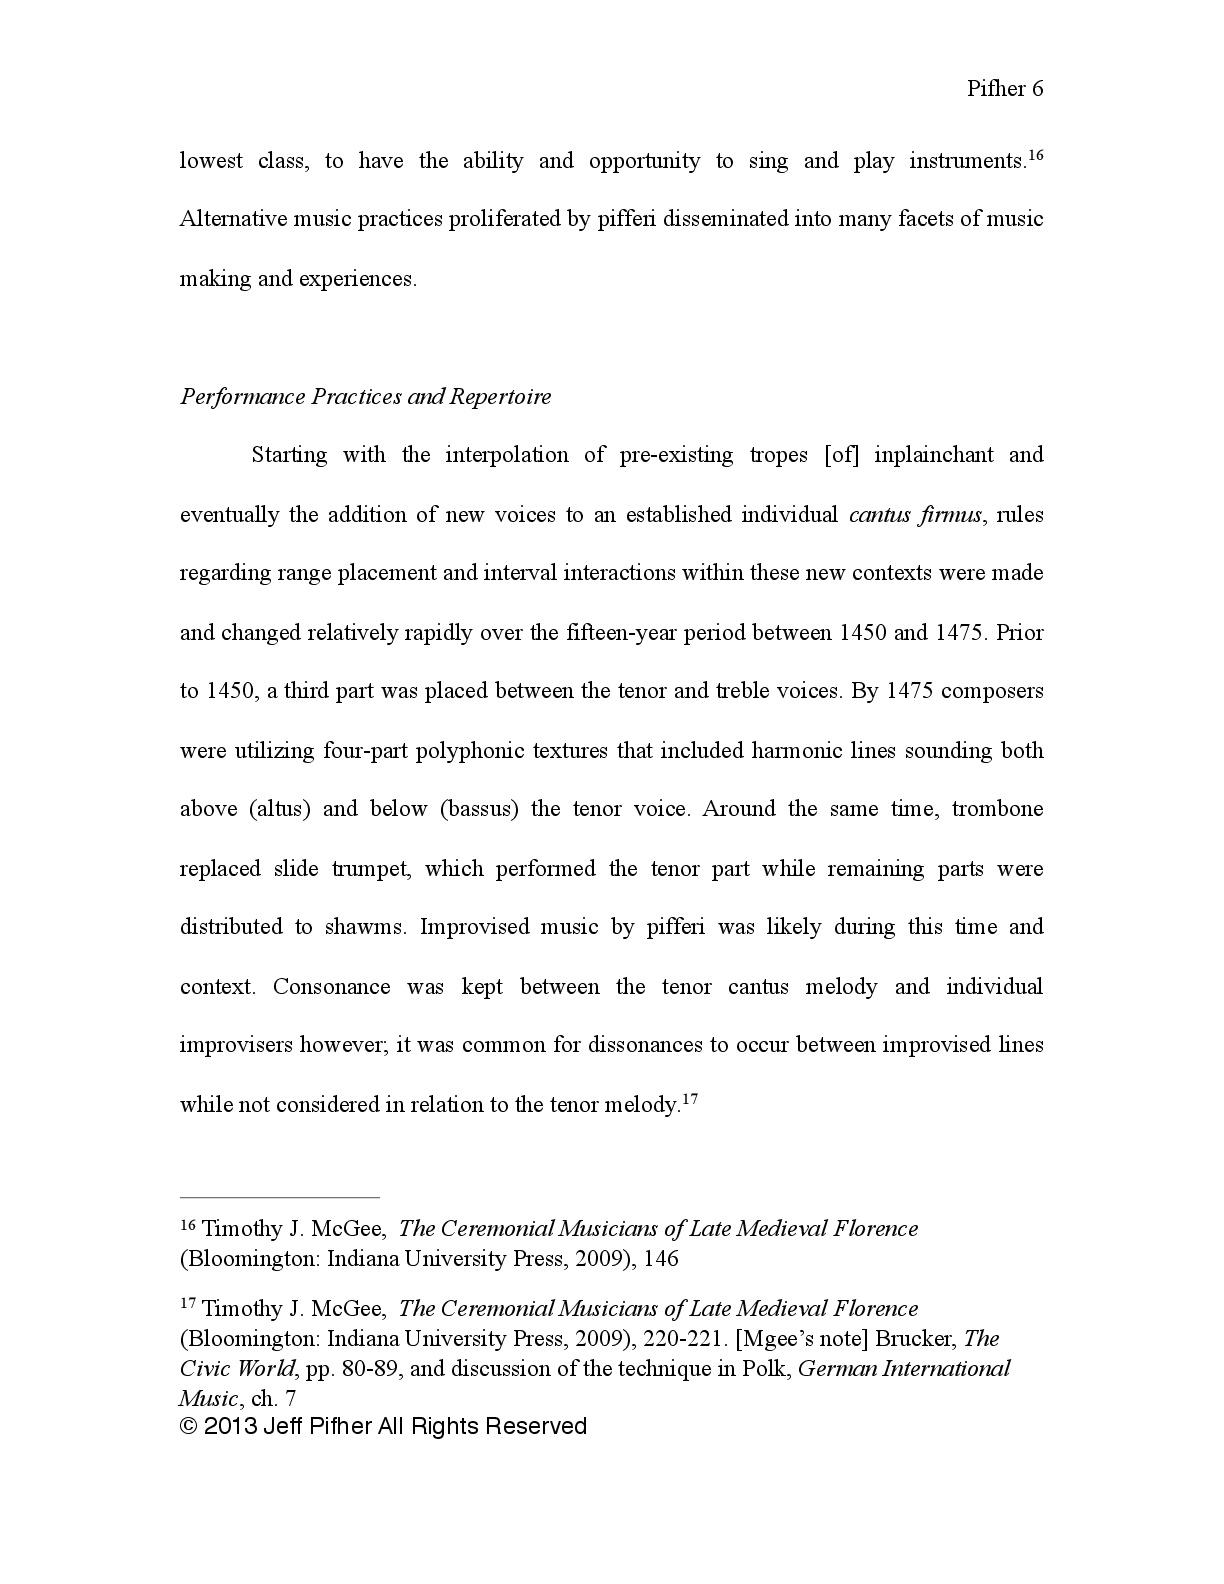 Jeff-Pifher-Music-and-Mediciean-Influences-(Academic-Series)-006.jpg